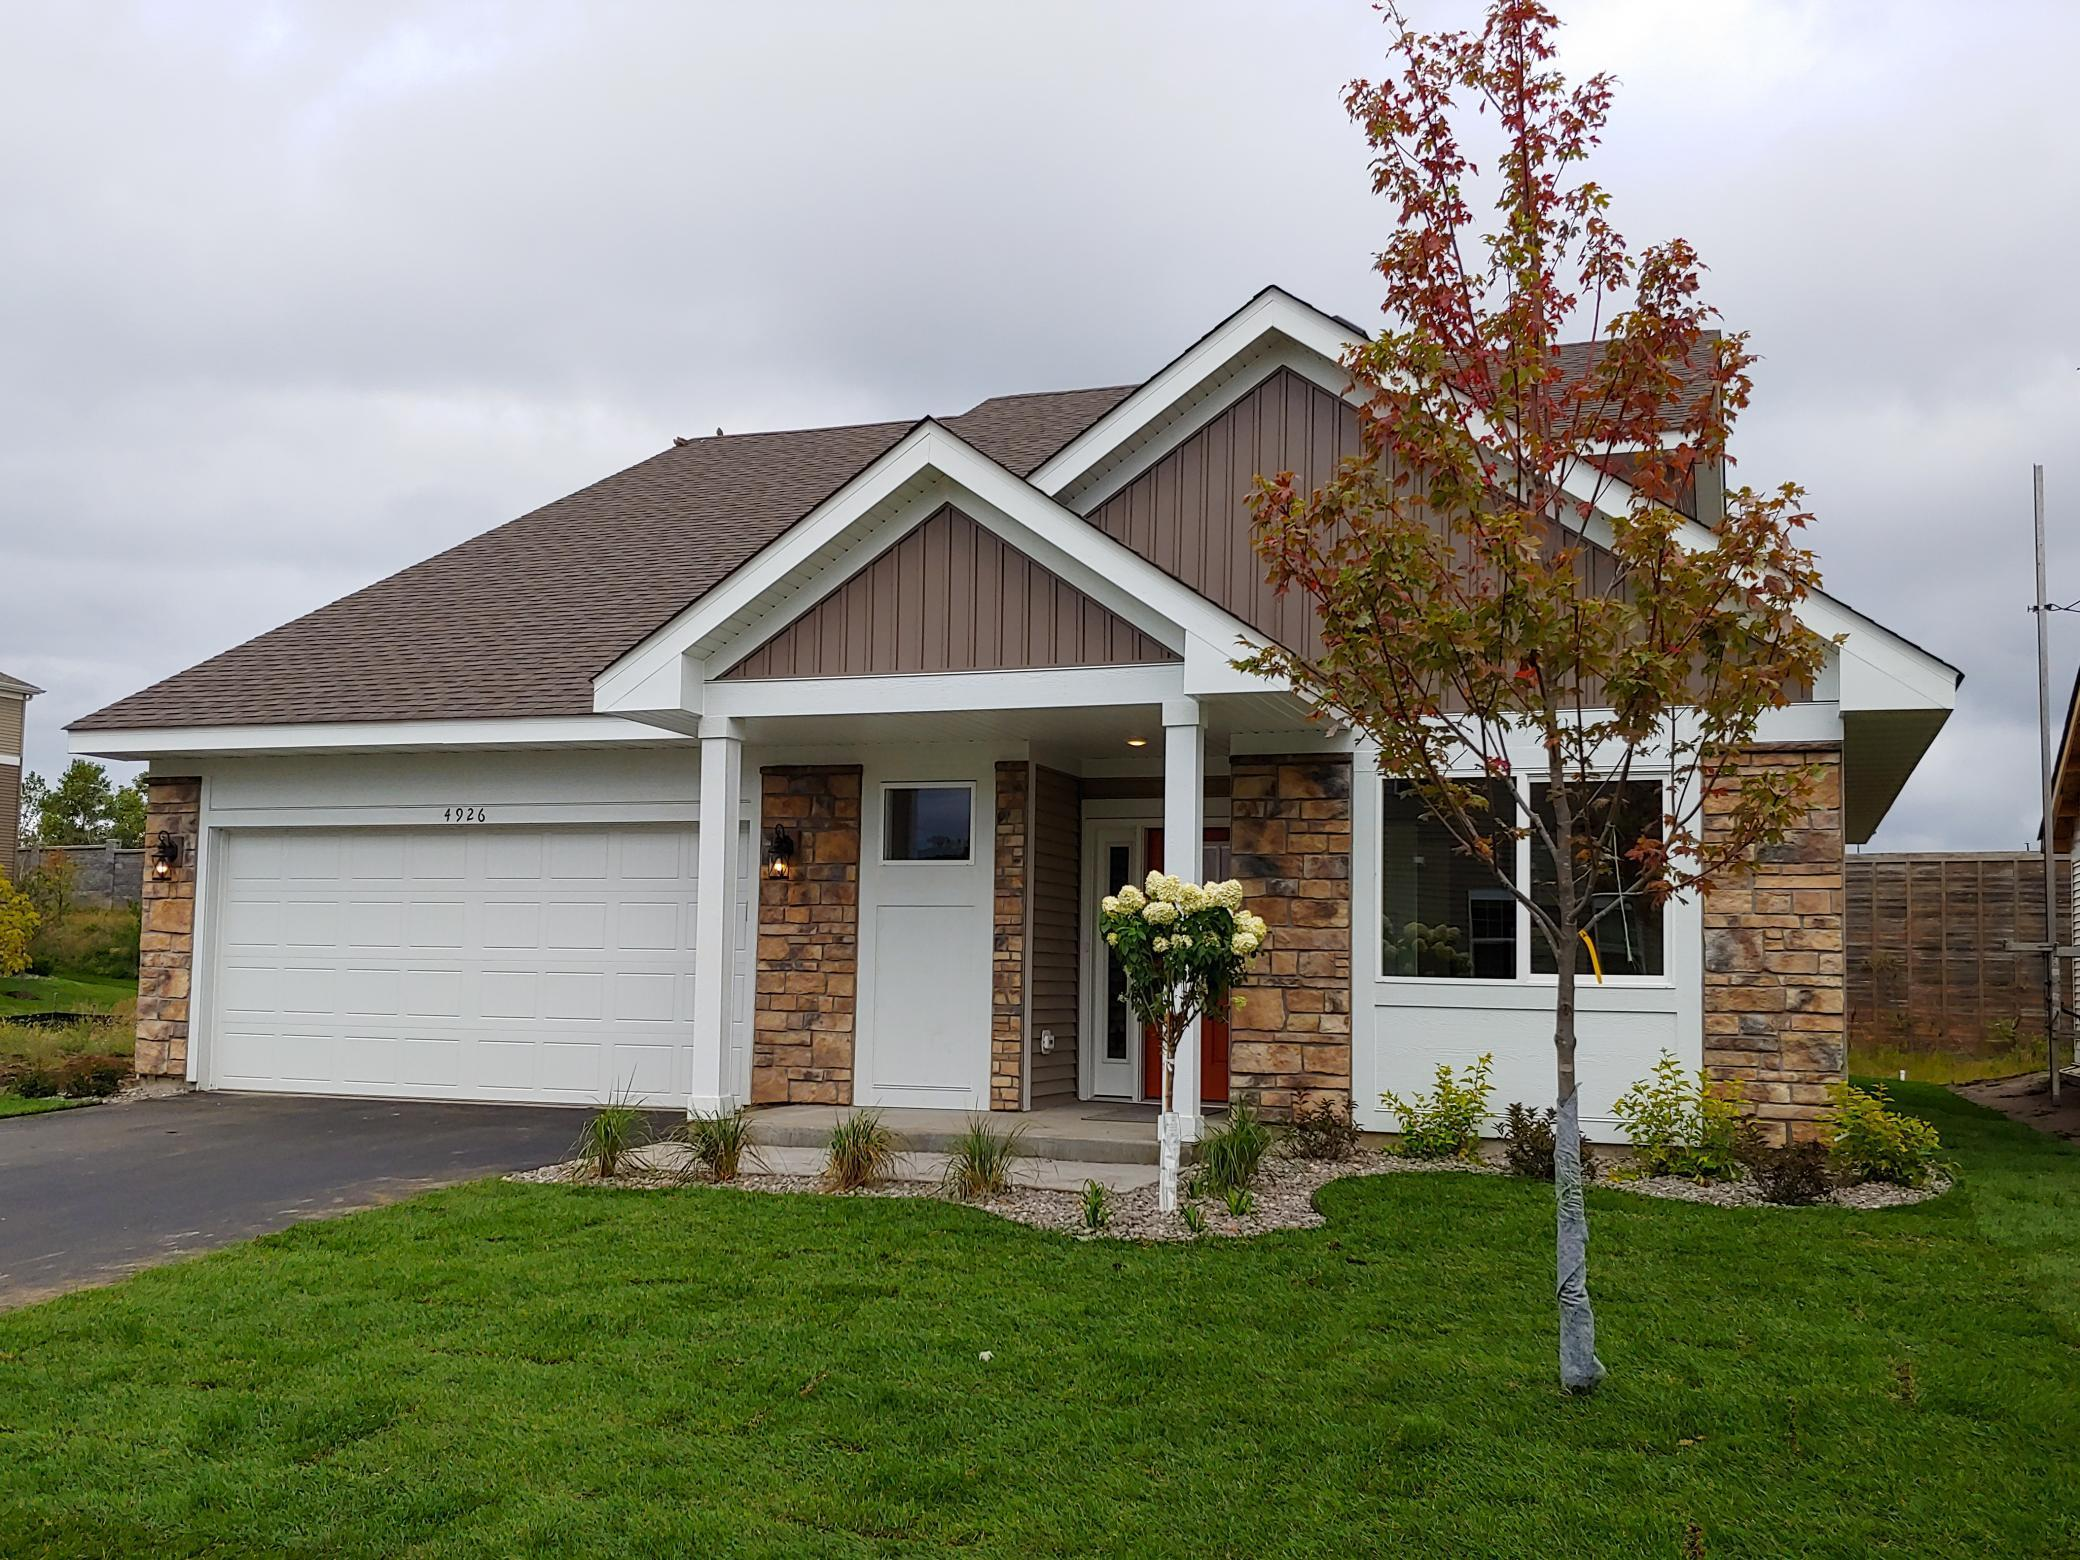 4918 93rd Way N Property Photo